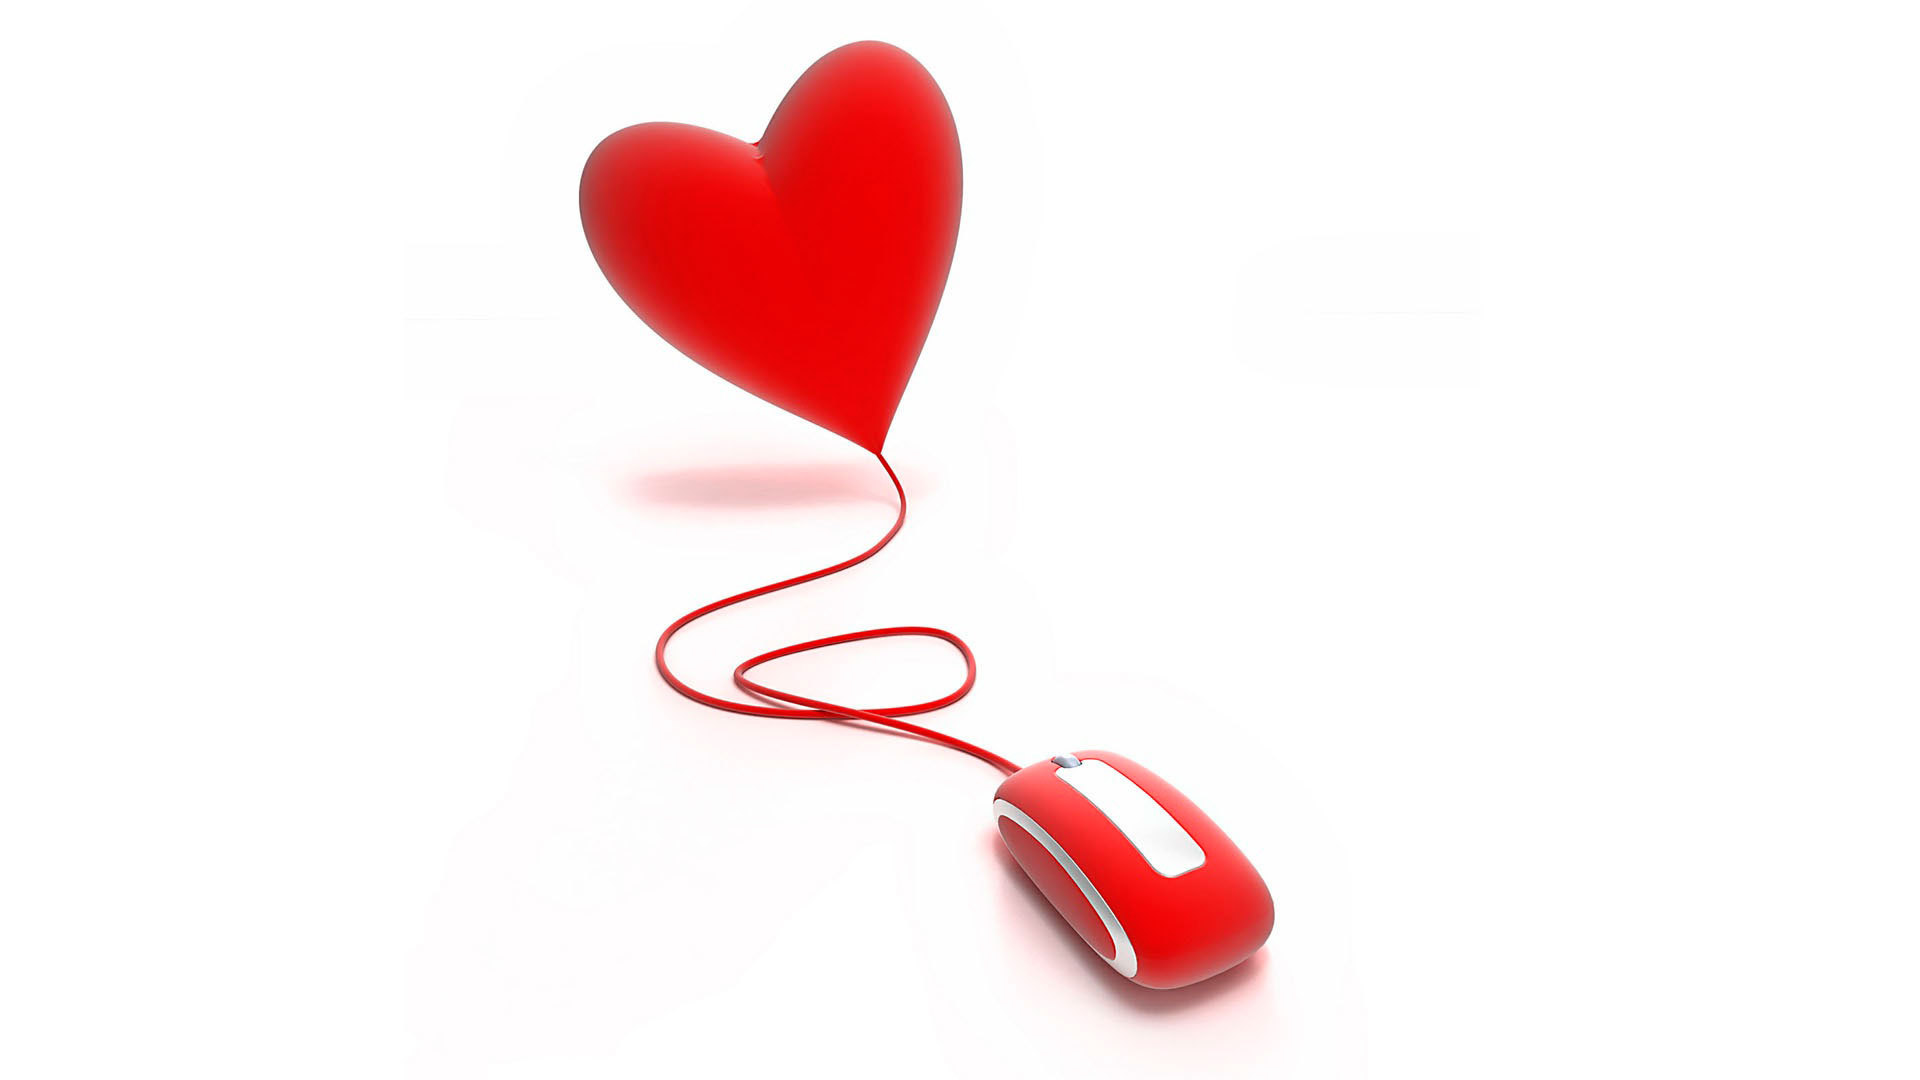 картинка на рабочий стол сердце занято что